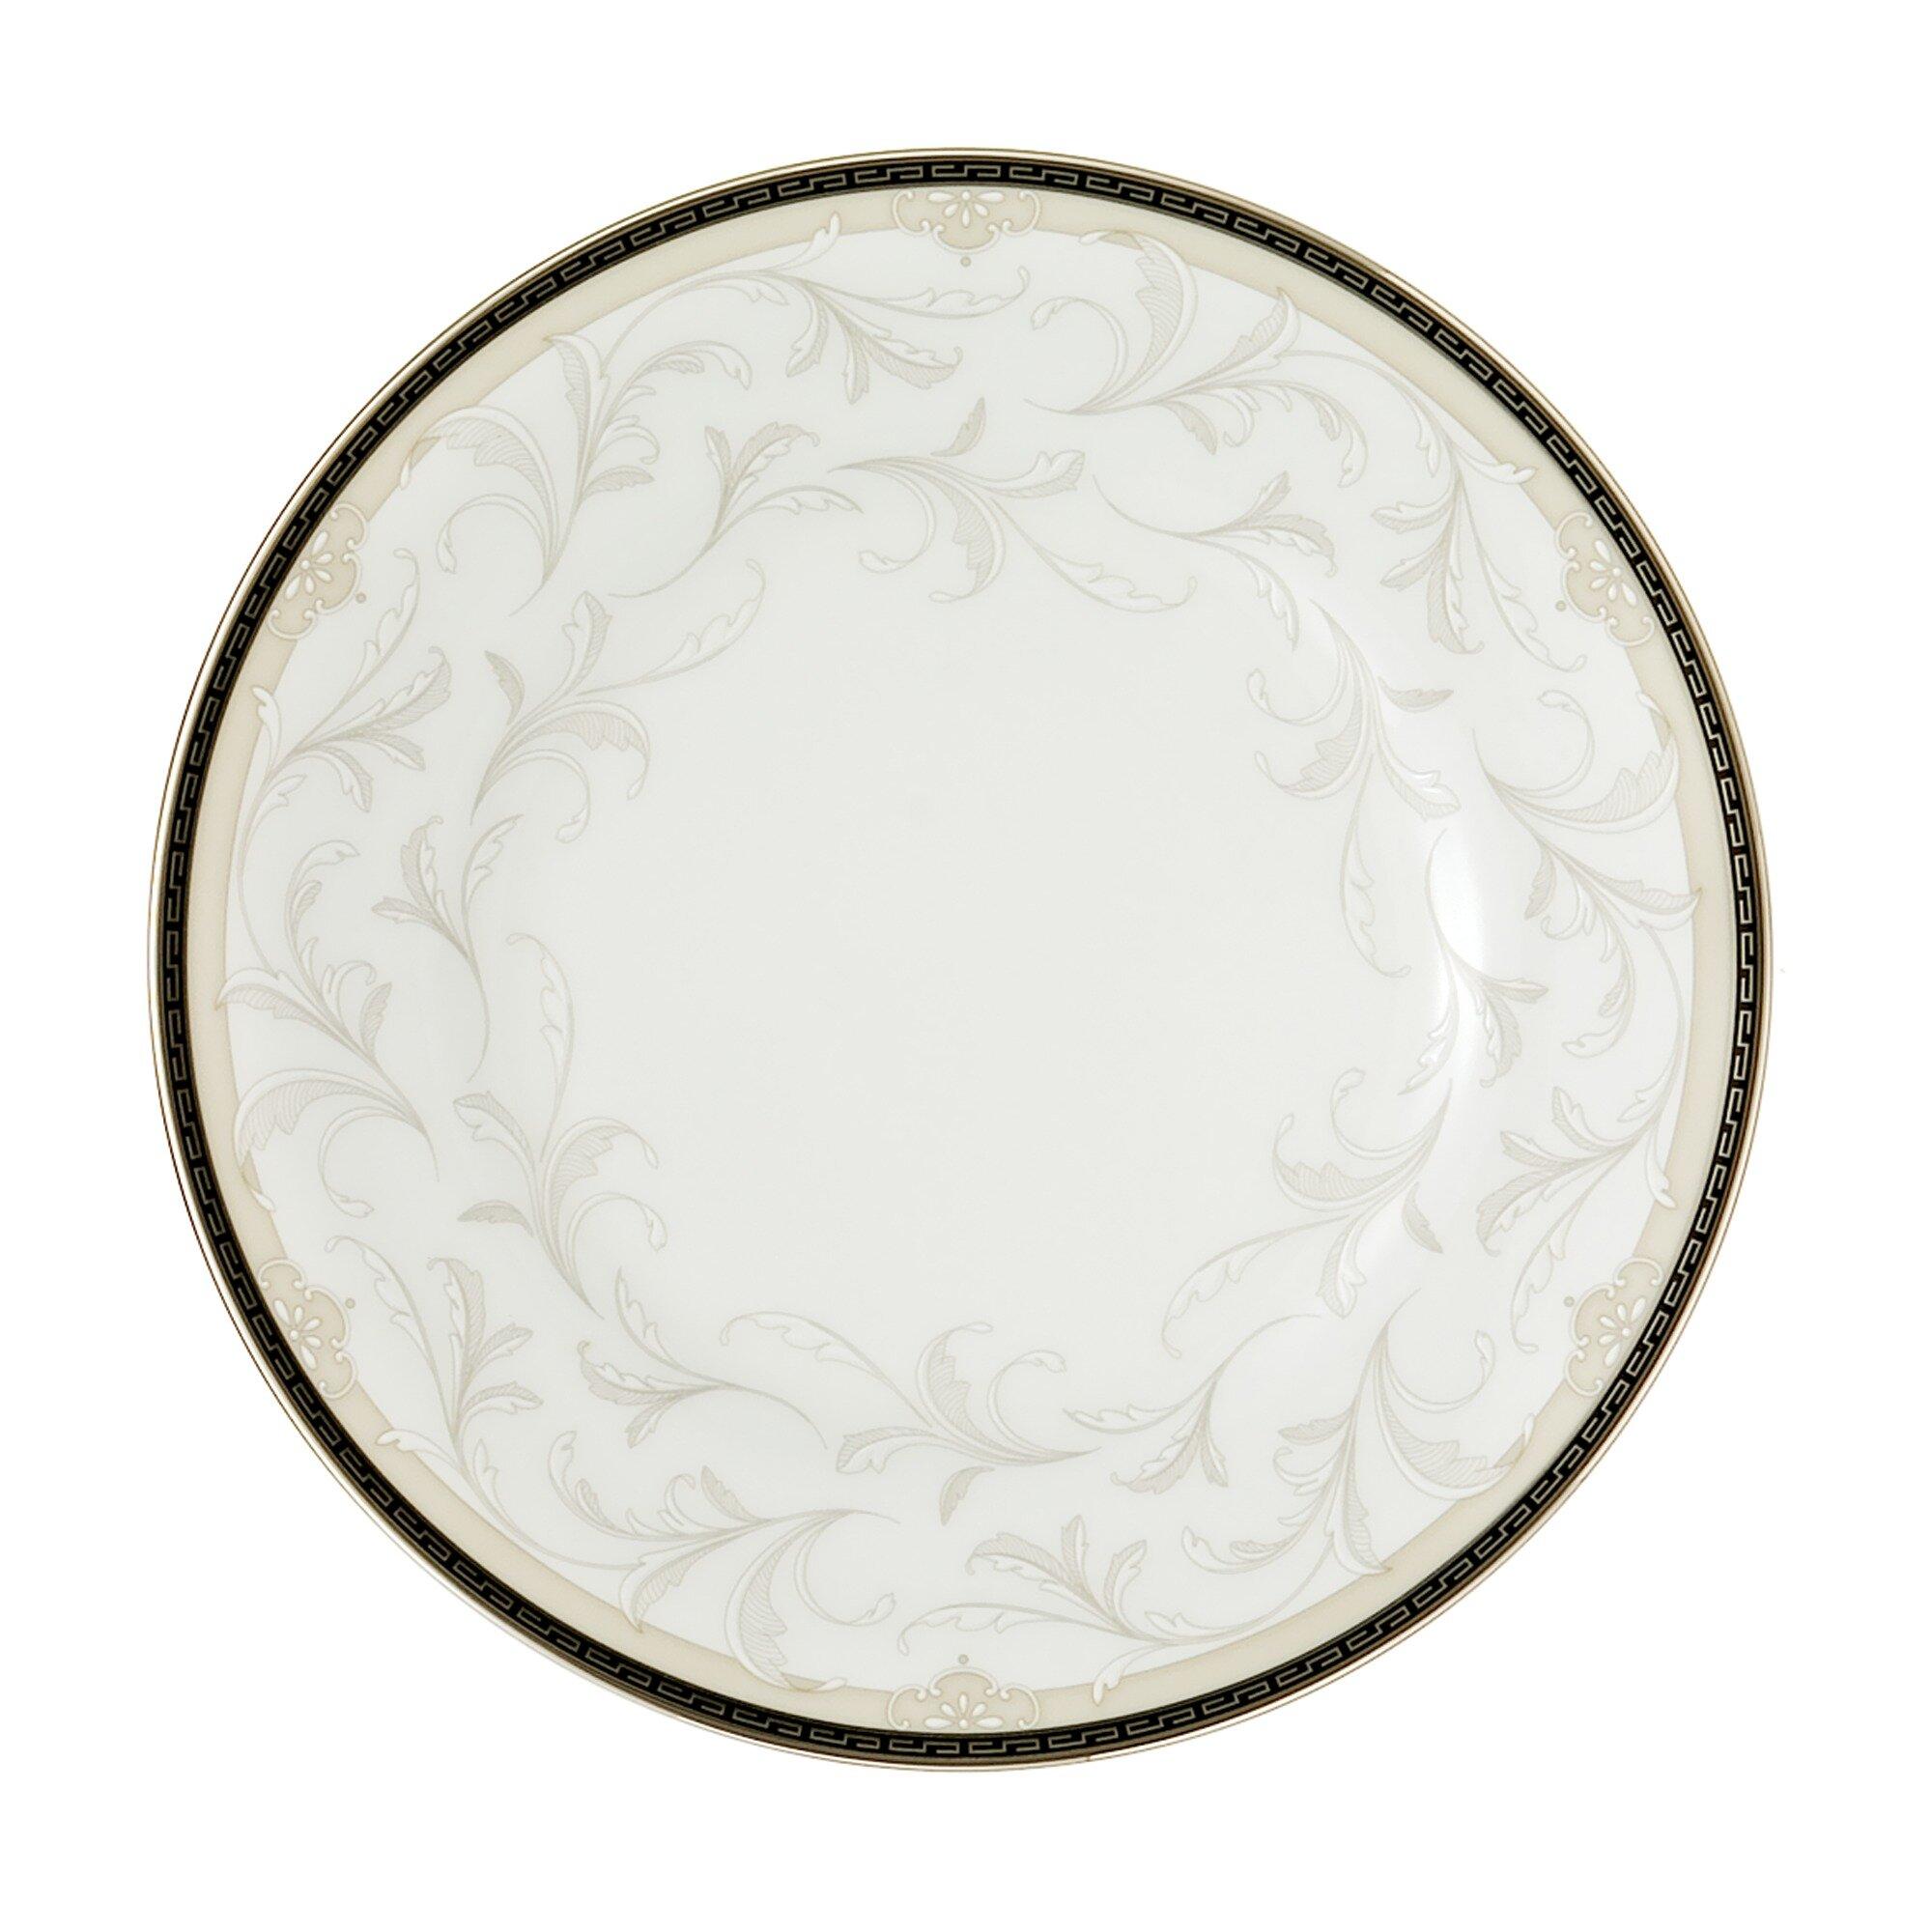 waterford brocade  salad  dessert plate  wayfair - waterford brocade quot salad  dessert plate